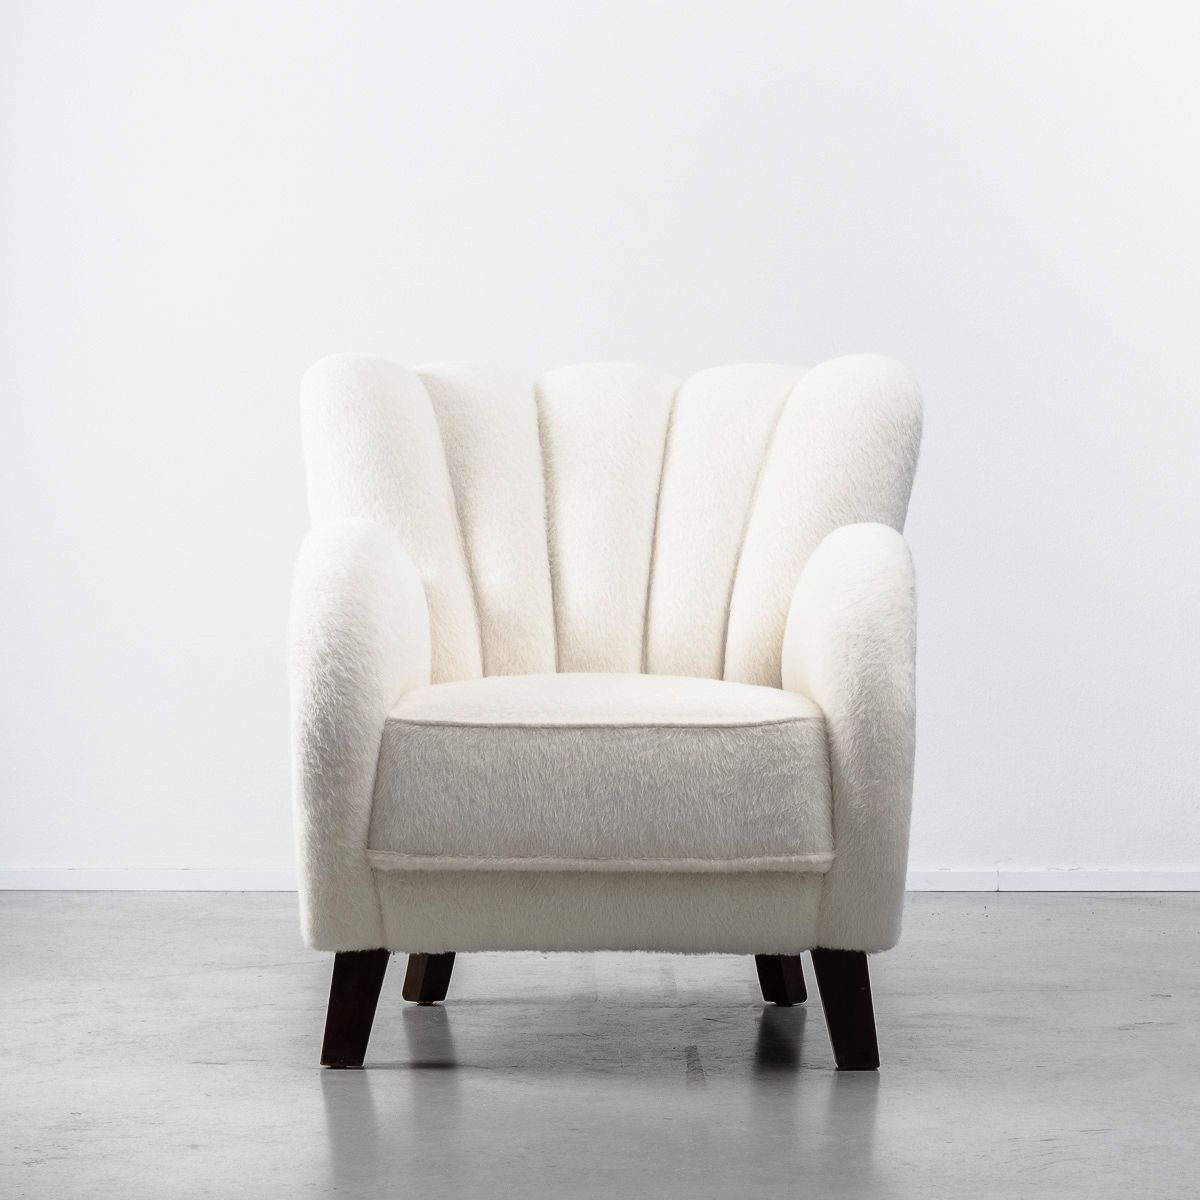 Dänischer Vintage Sessel, 1930er